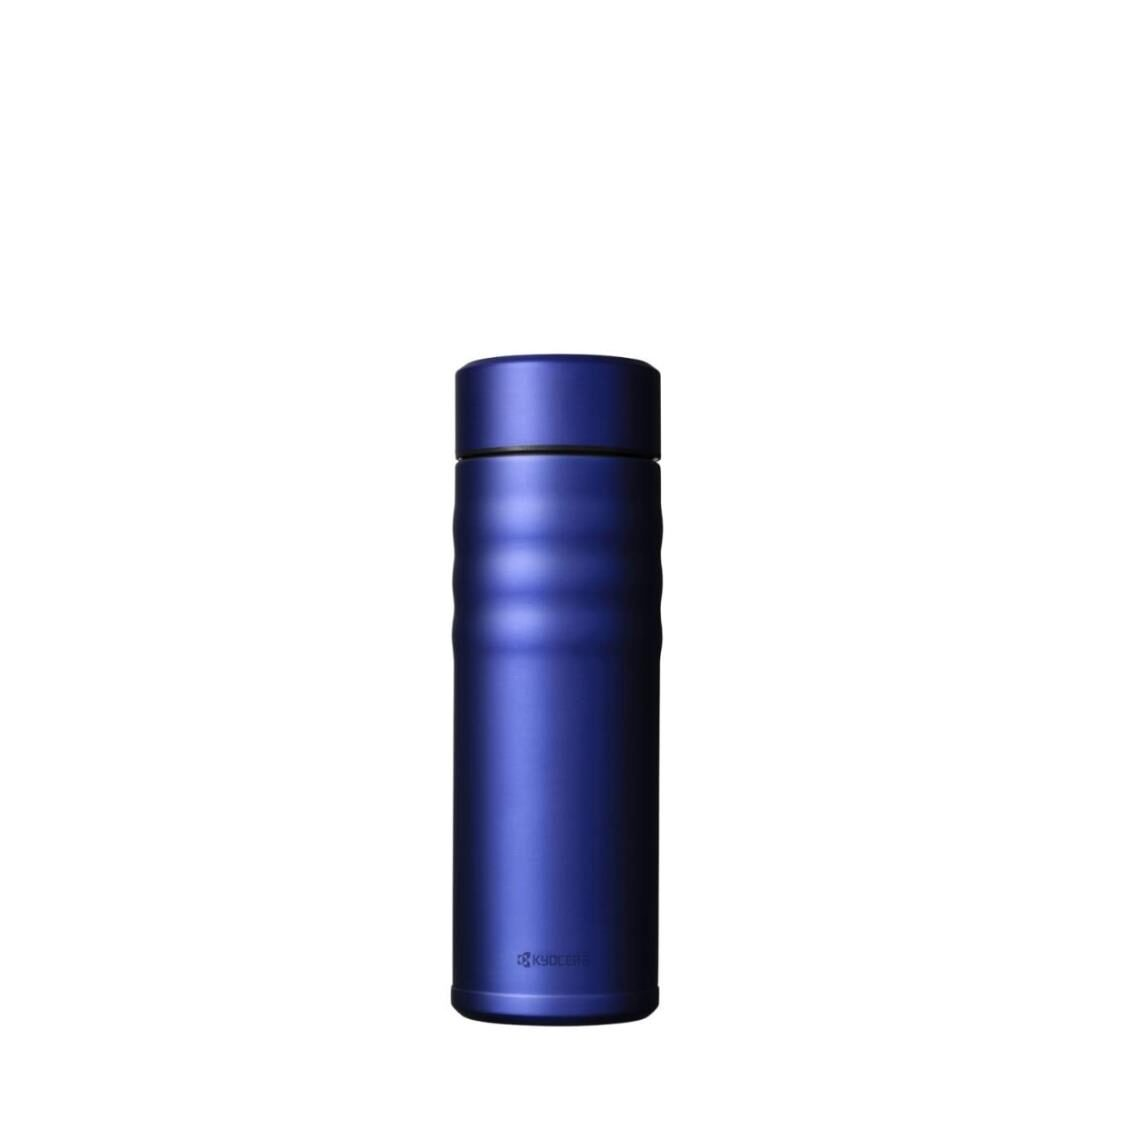 Kyocera Advanced Ceramic 500ml Cerabrid Mug - Royal Blue CSB-S500-BRBU